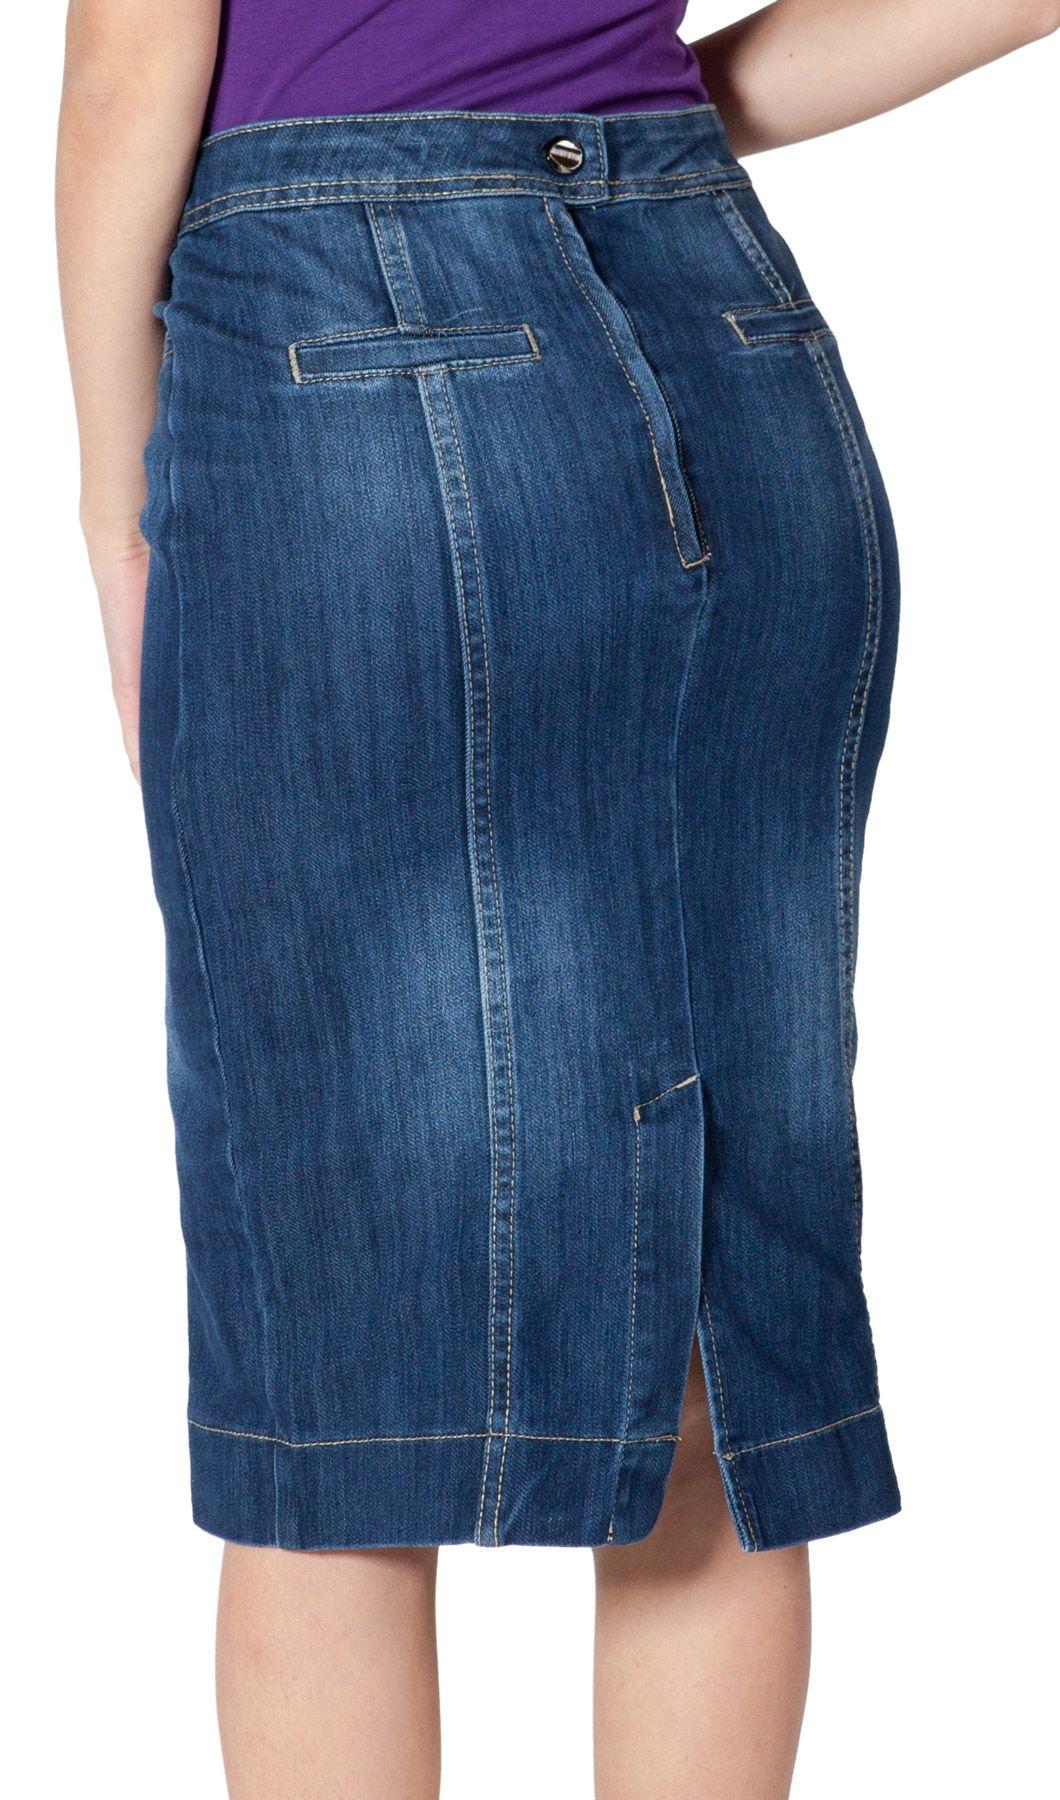 df5c33019e Knee Length Denim Skirt - Plus Size Skirts (16+) available #Denim Skirts  #plussize